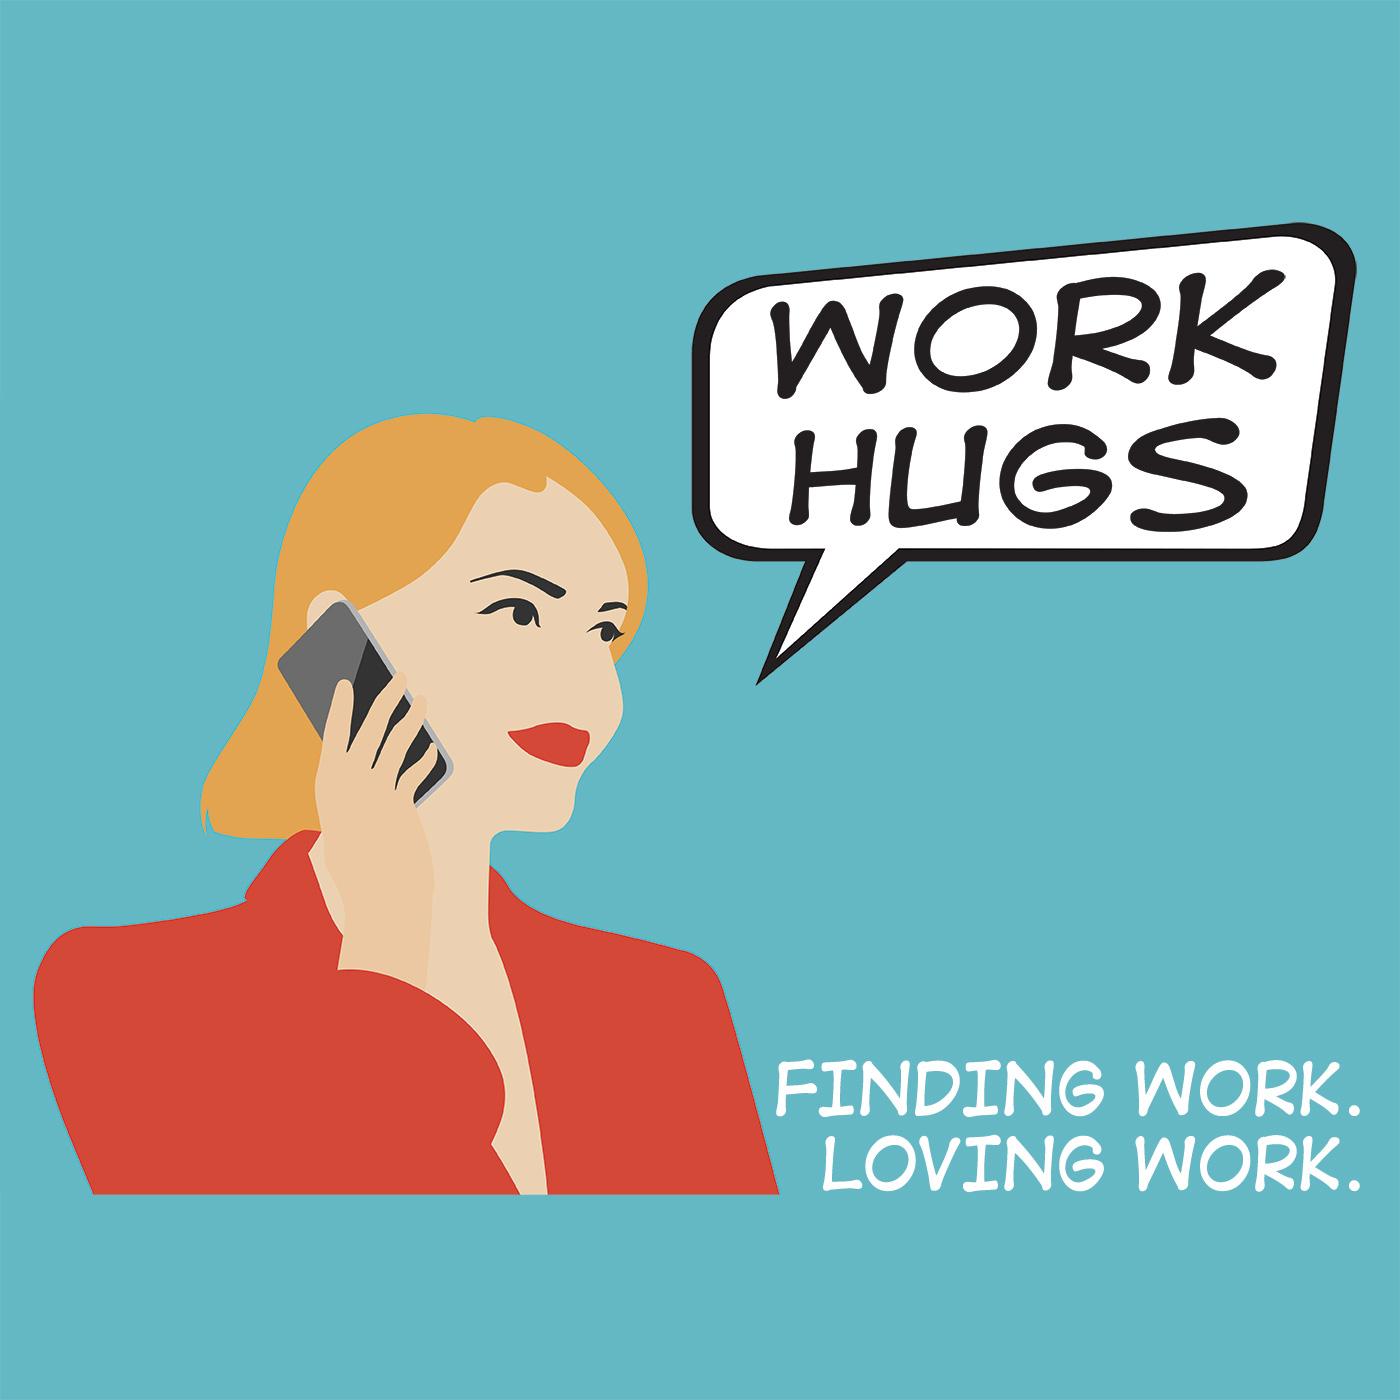 Work Hugs